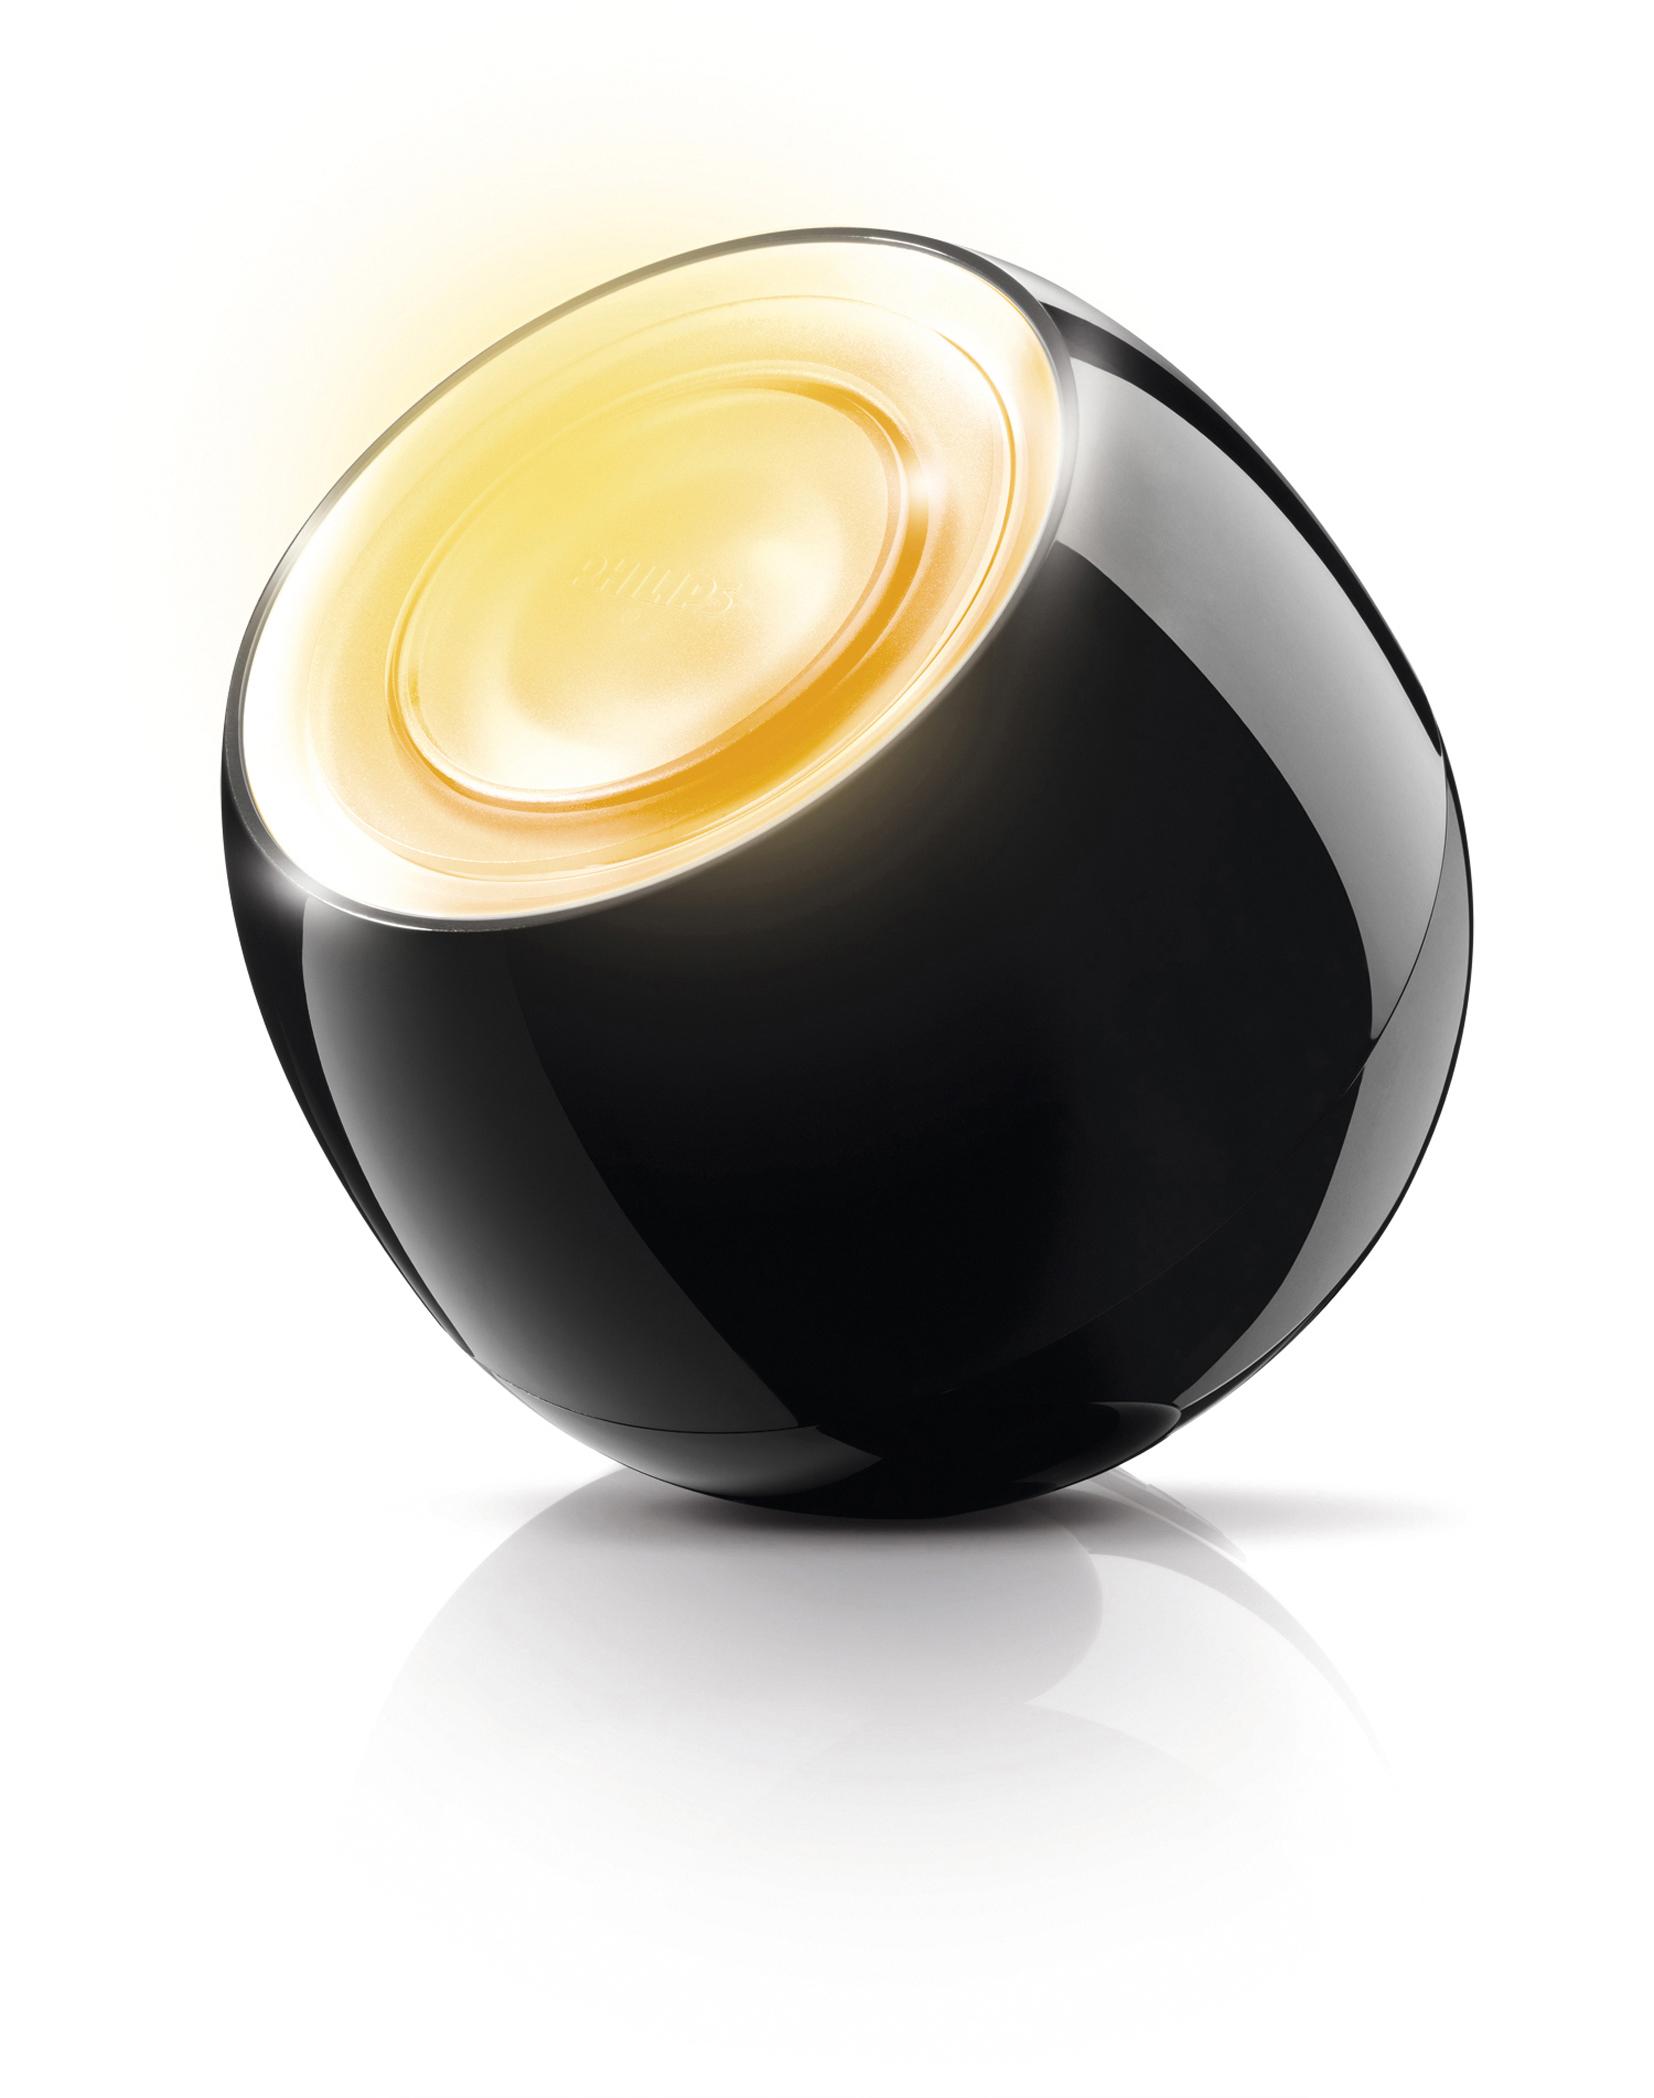 philips breidt livingcolors serie uit met trendy livingcolors mini lampen. Black Bedroom Furniture Sets. Home Design Ideas